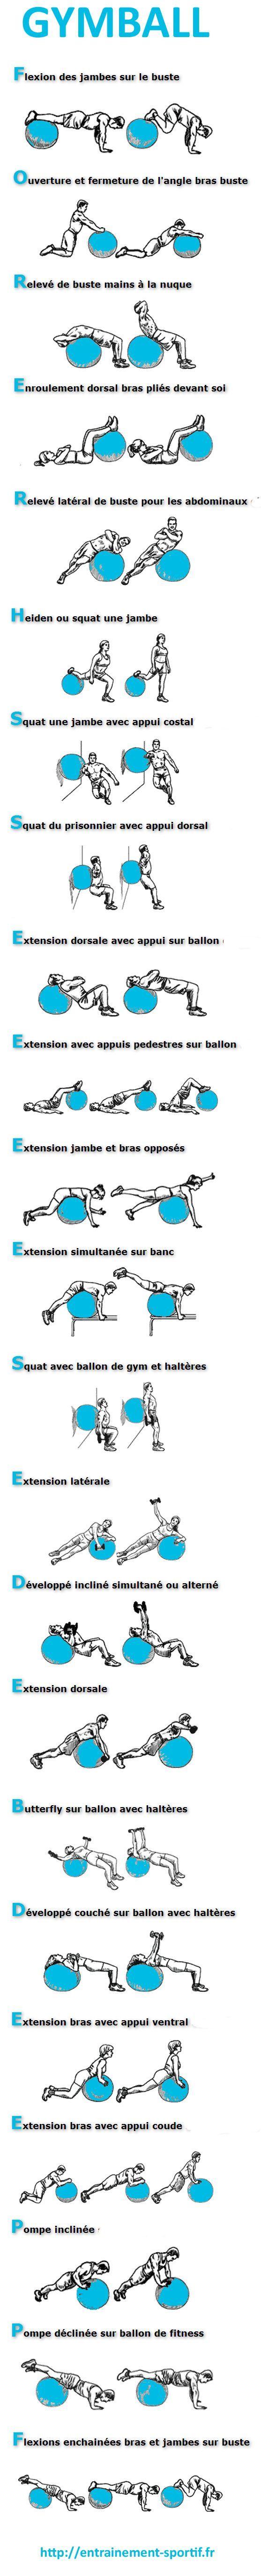 Le ballon de gym a tout bon : 23 exercices de musculation à faire chez soi avec un ballon de gym